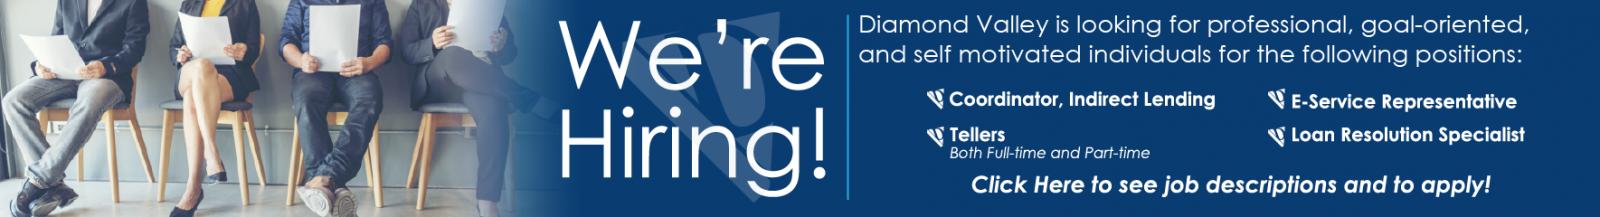 Diamond Valley is hiring!